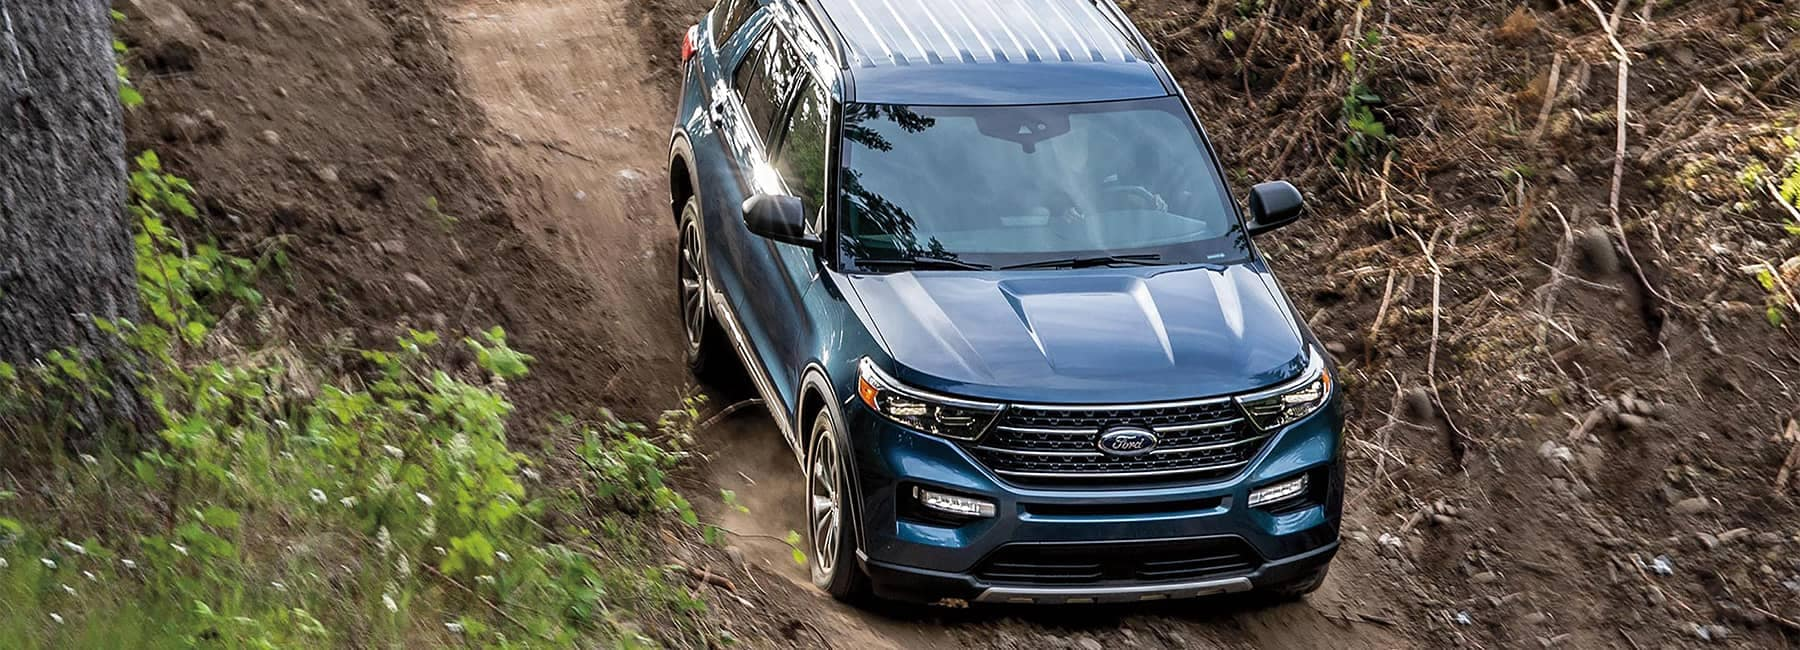 Blue 2021 Ford Explorer driving through a mud pass